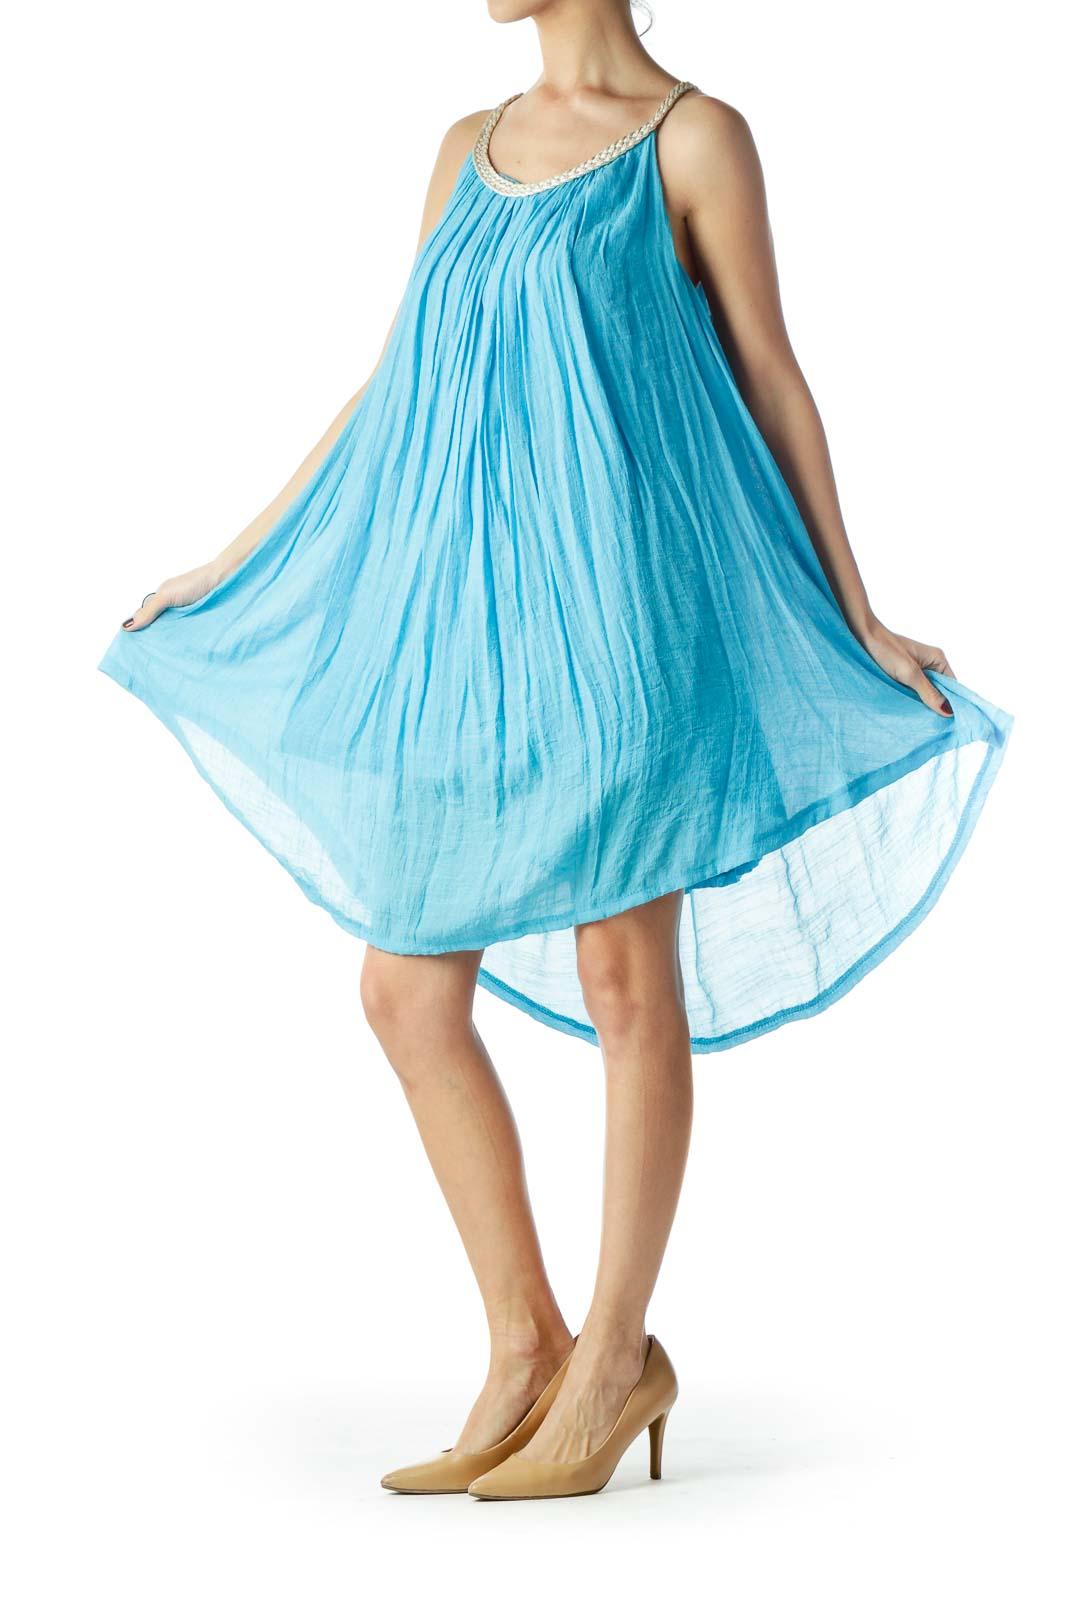 Turquoise Blue Halter Neckline Flared Dress